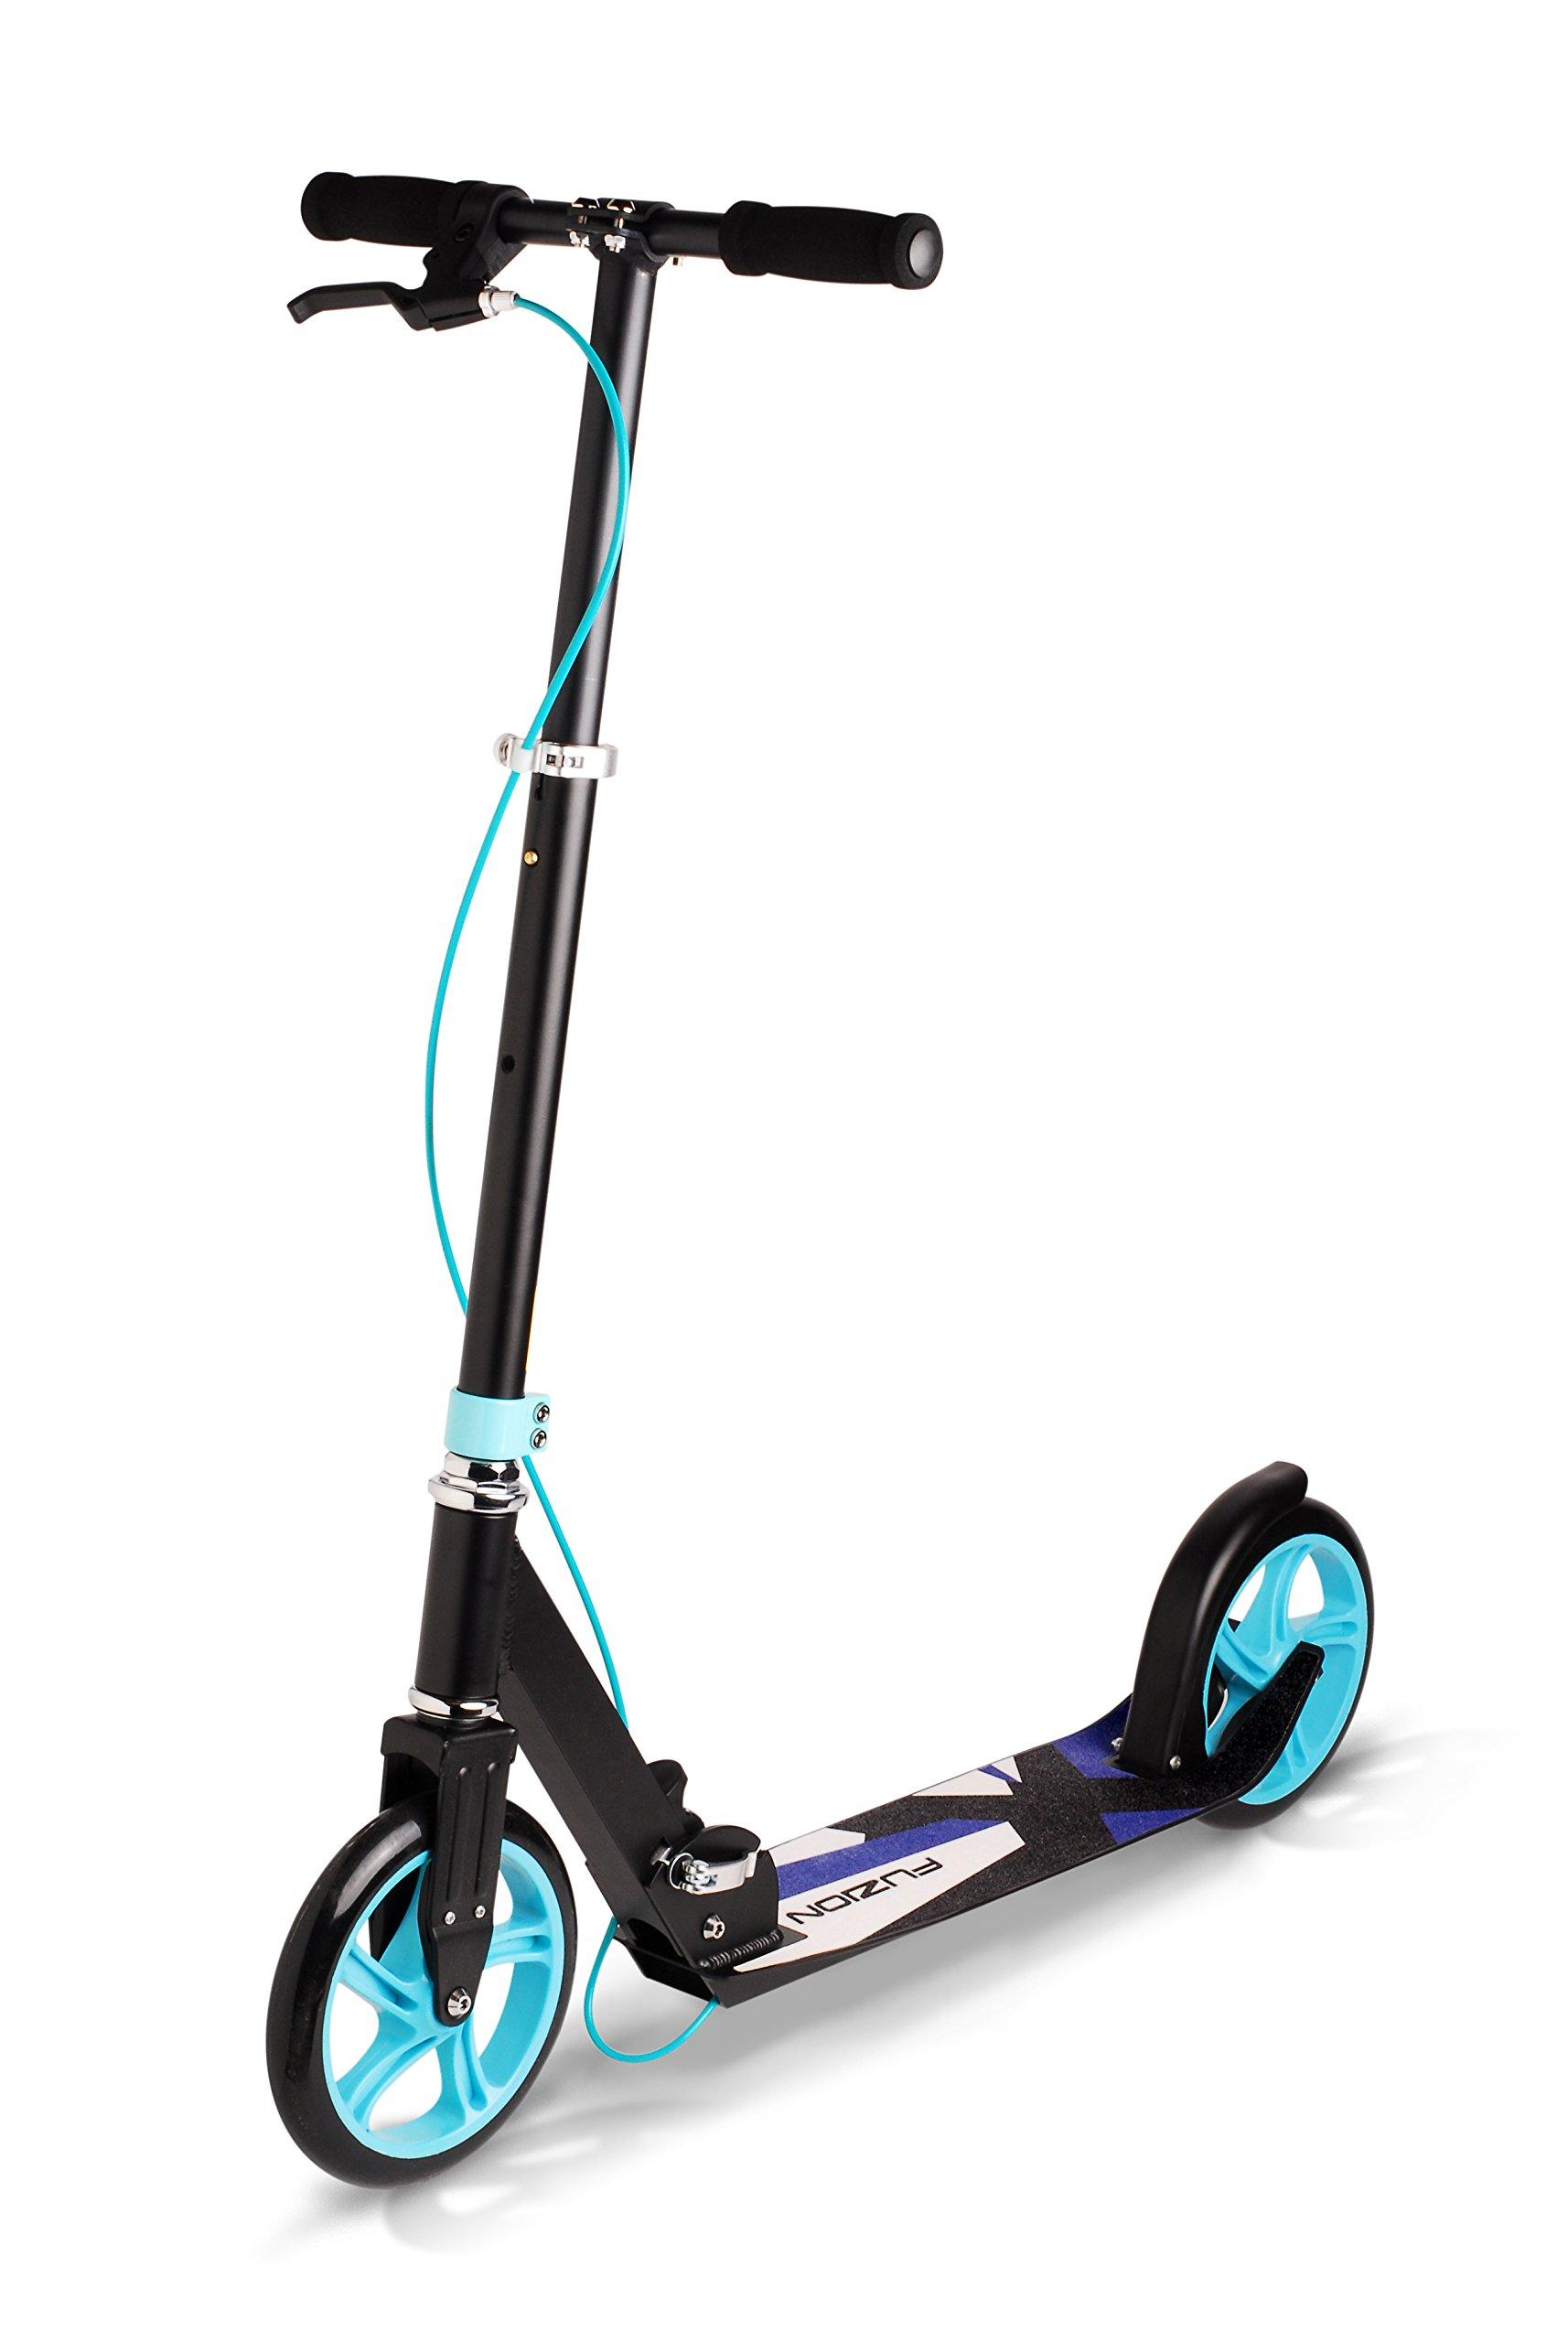 Fuzion CityGlide 2-Wheel Scooter, Black by Fuzion